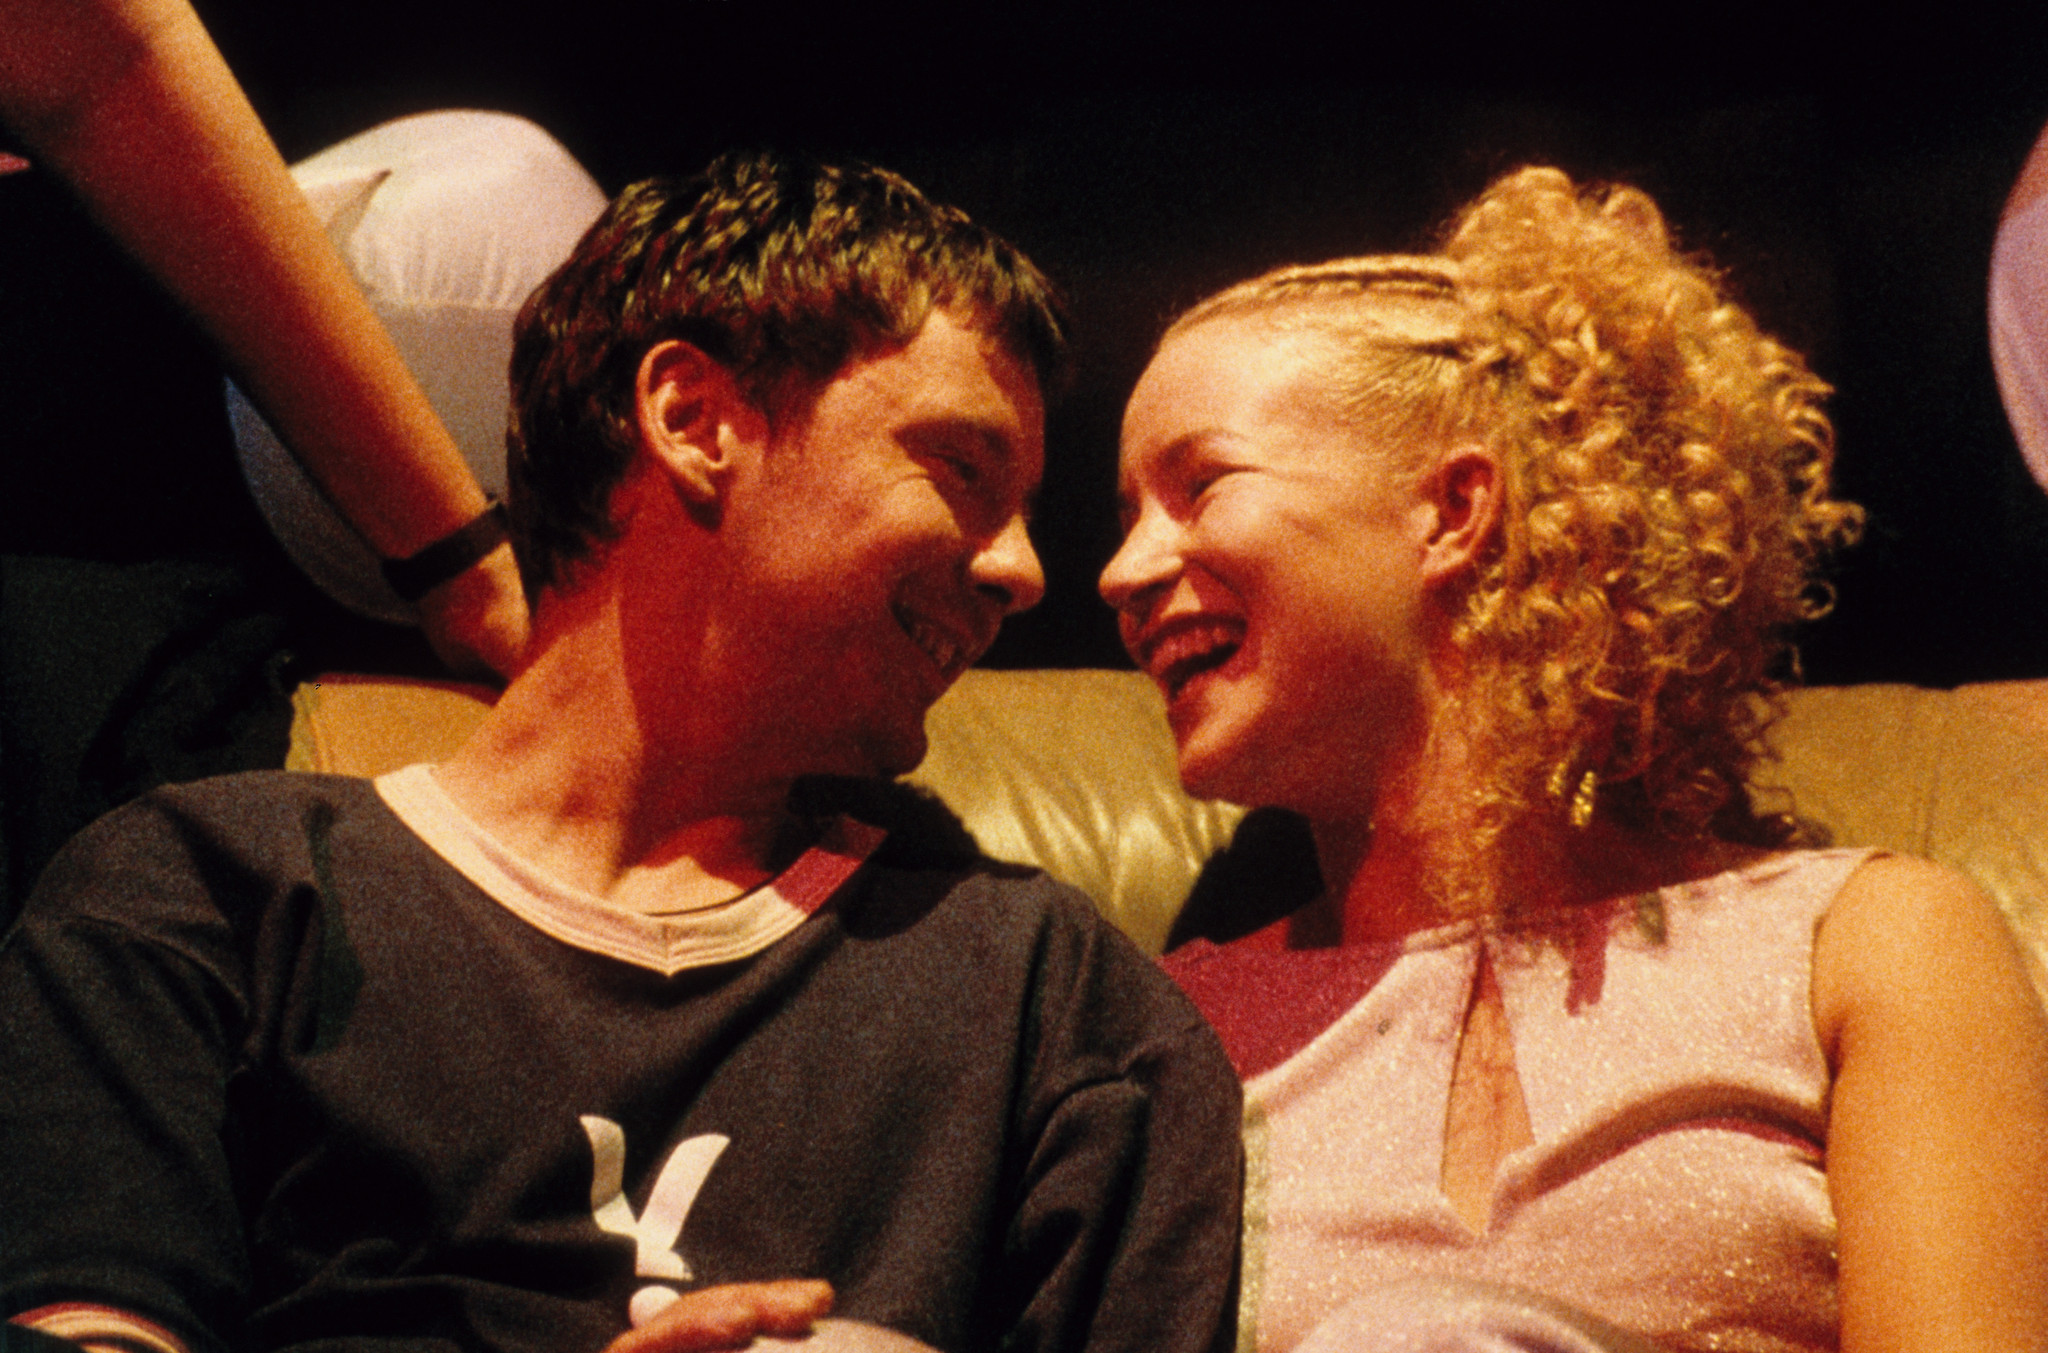 Lorraine Pilkington and John Simm in Human Traffic (1999)